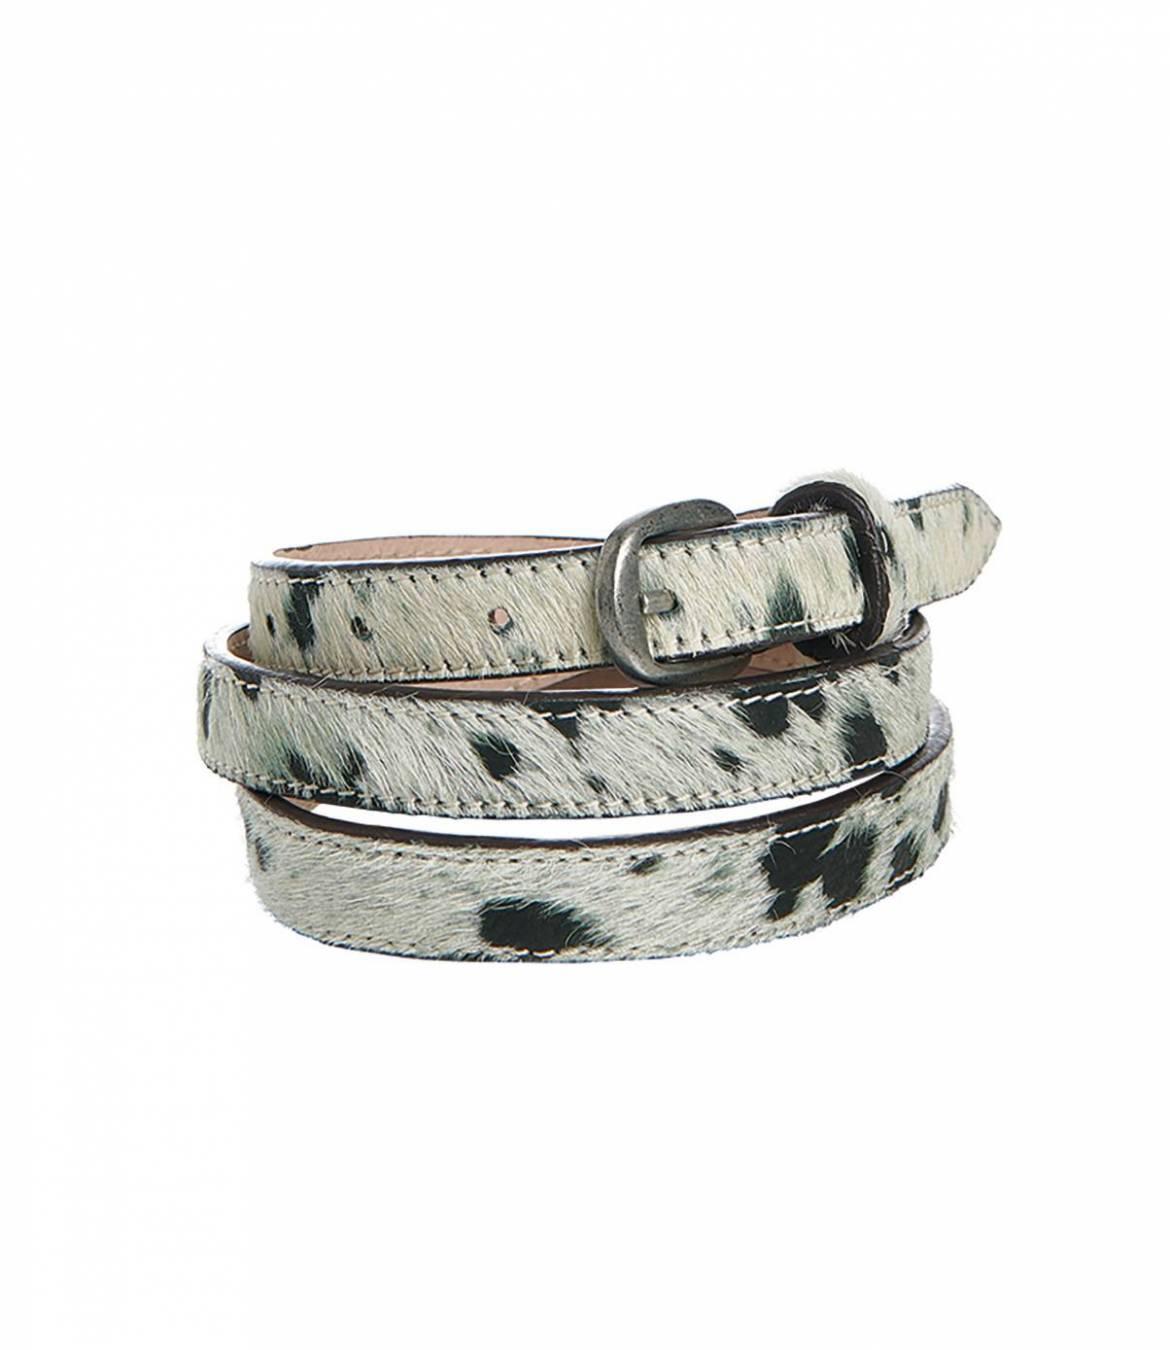 BELT CUIR Leather Belts for Women Storiatipic - 1